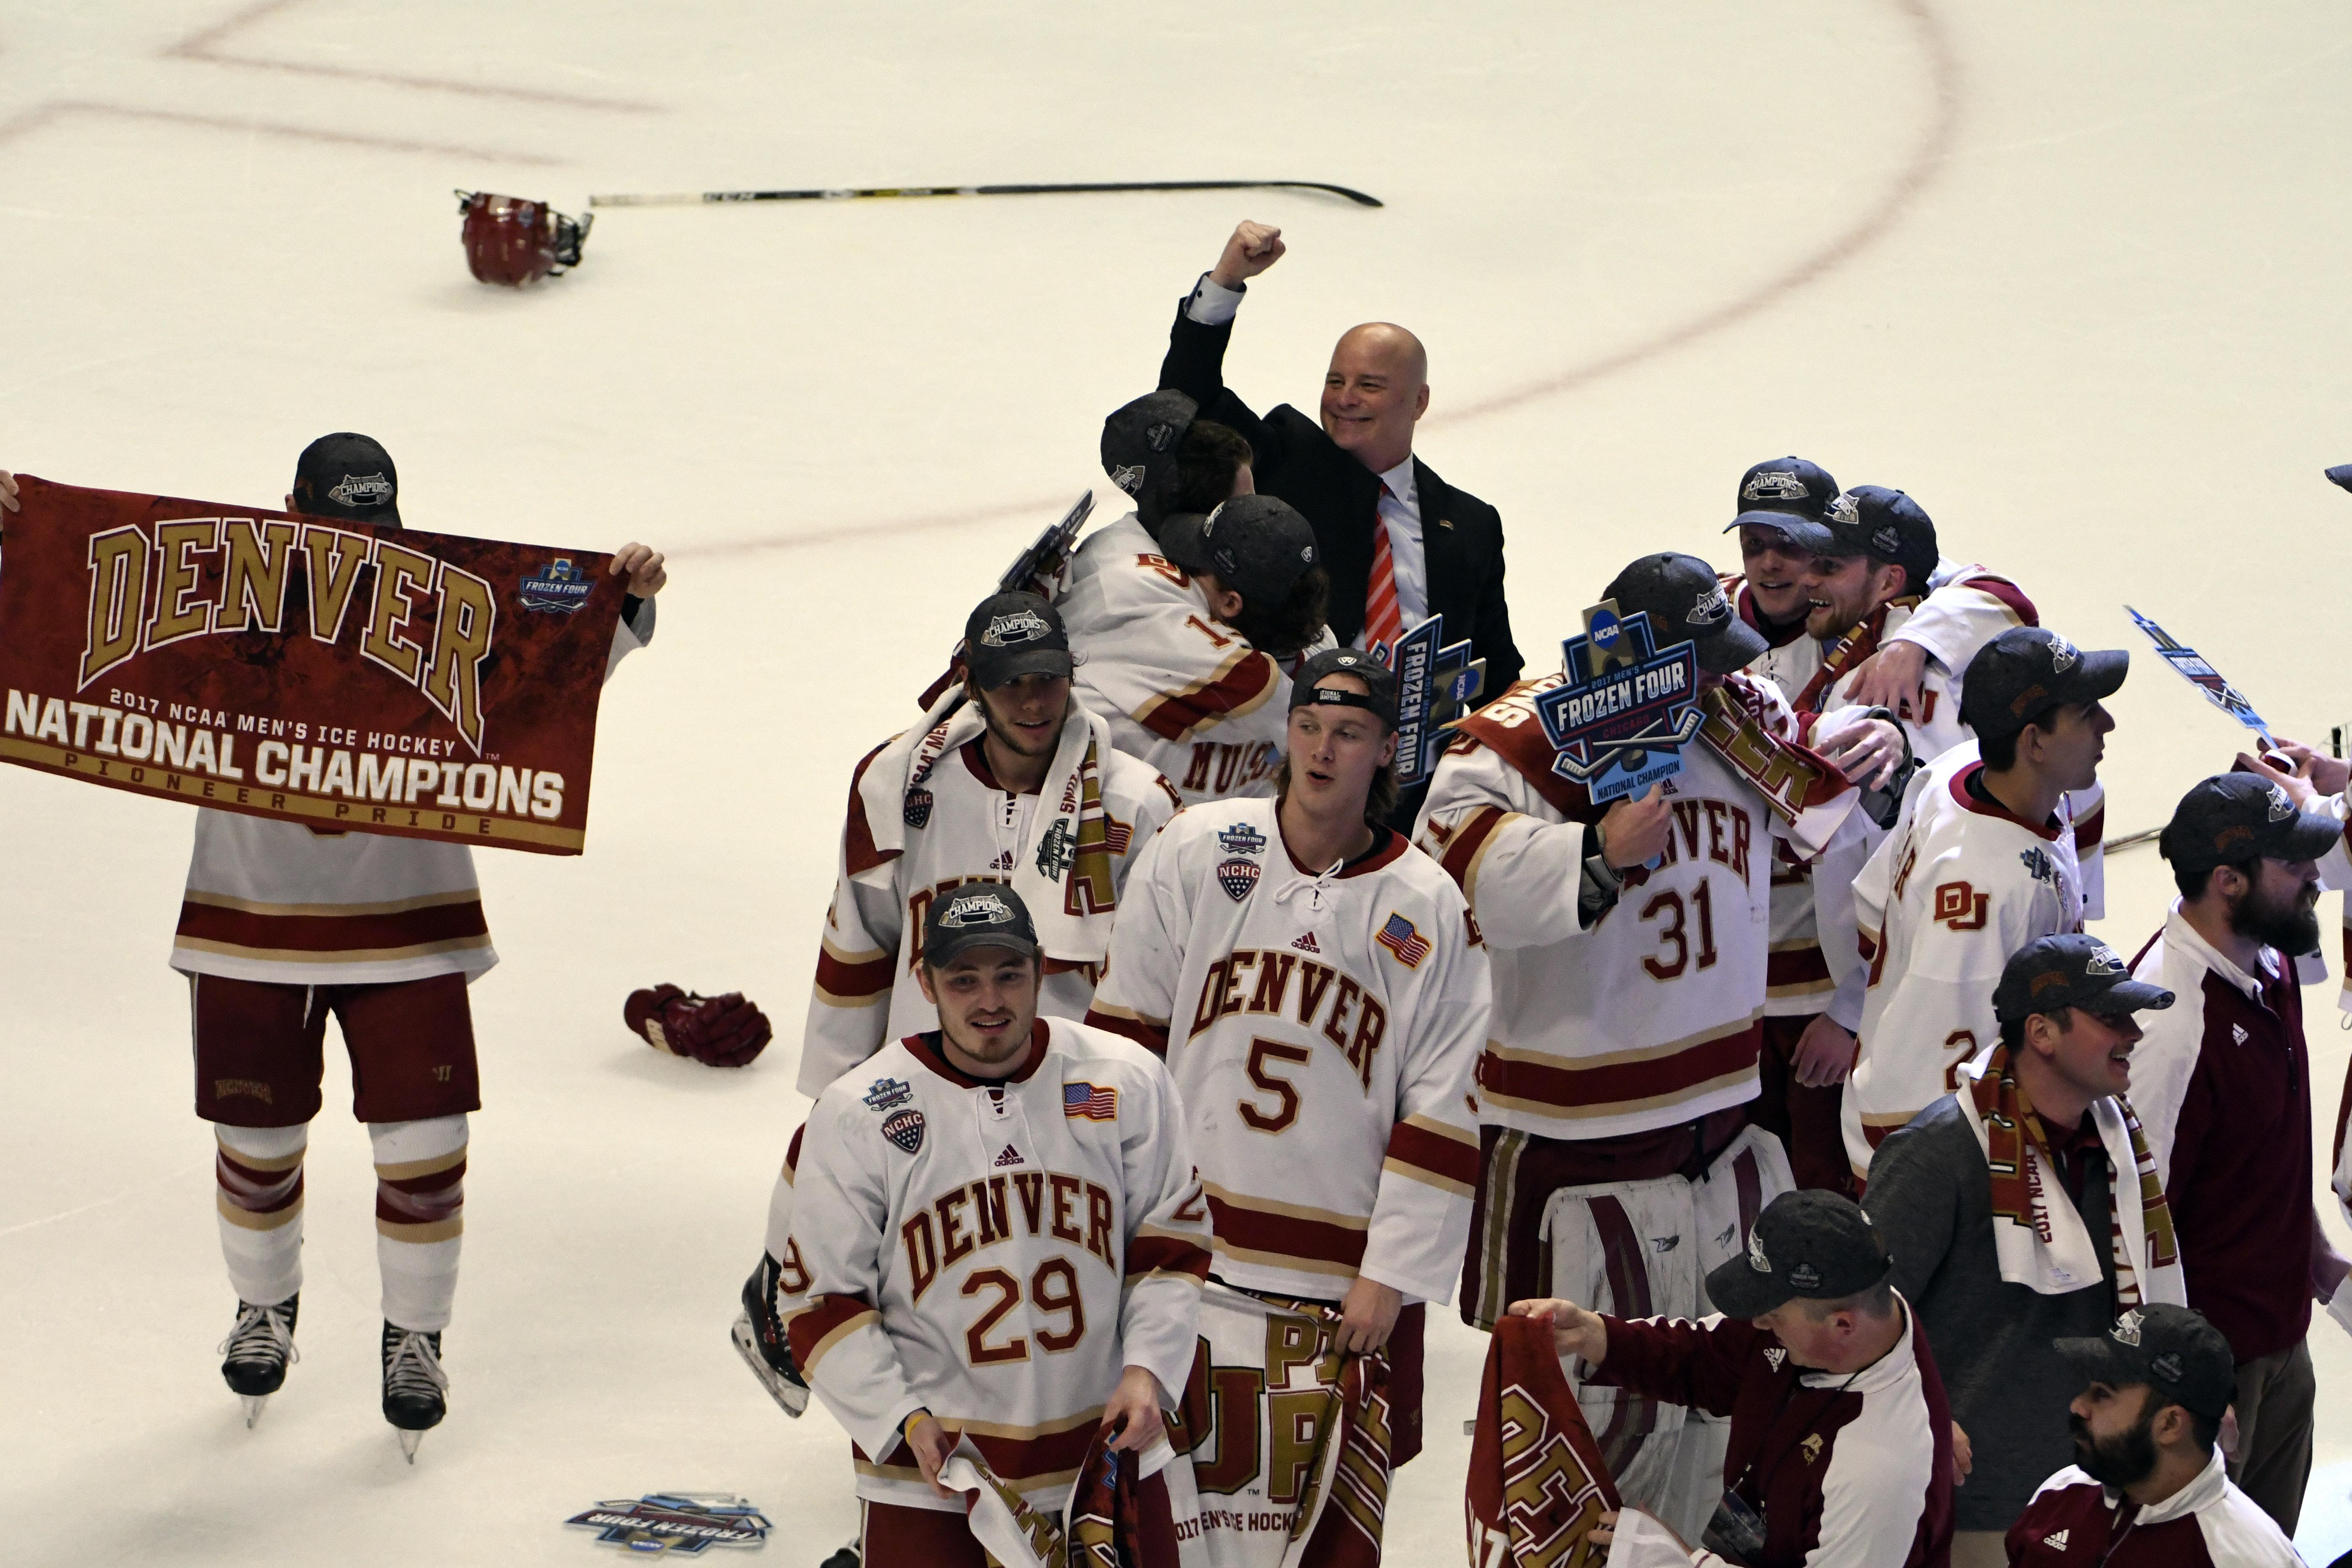 10002650-ncaa-hockey-frozen-four-denver-vs-minnesota-duluth